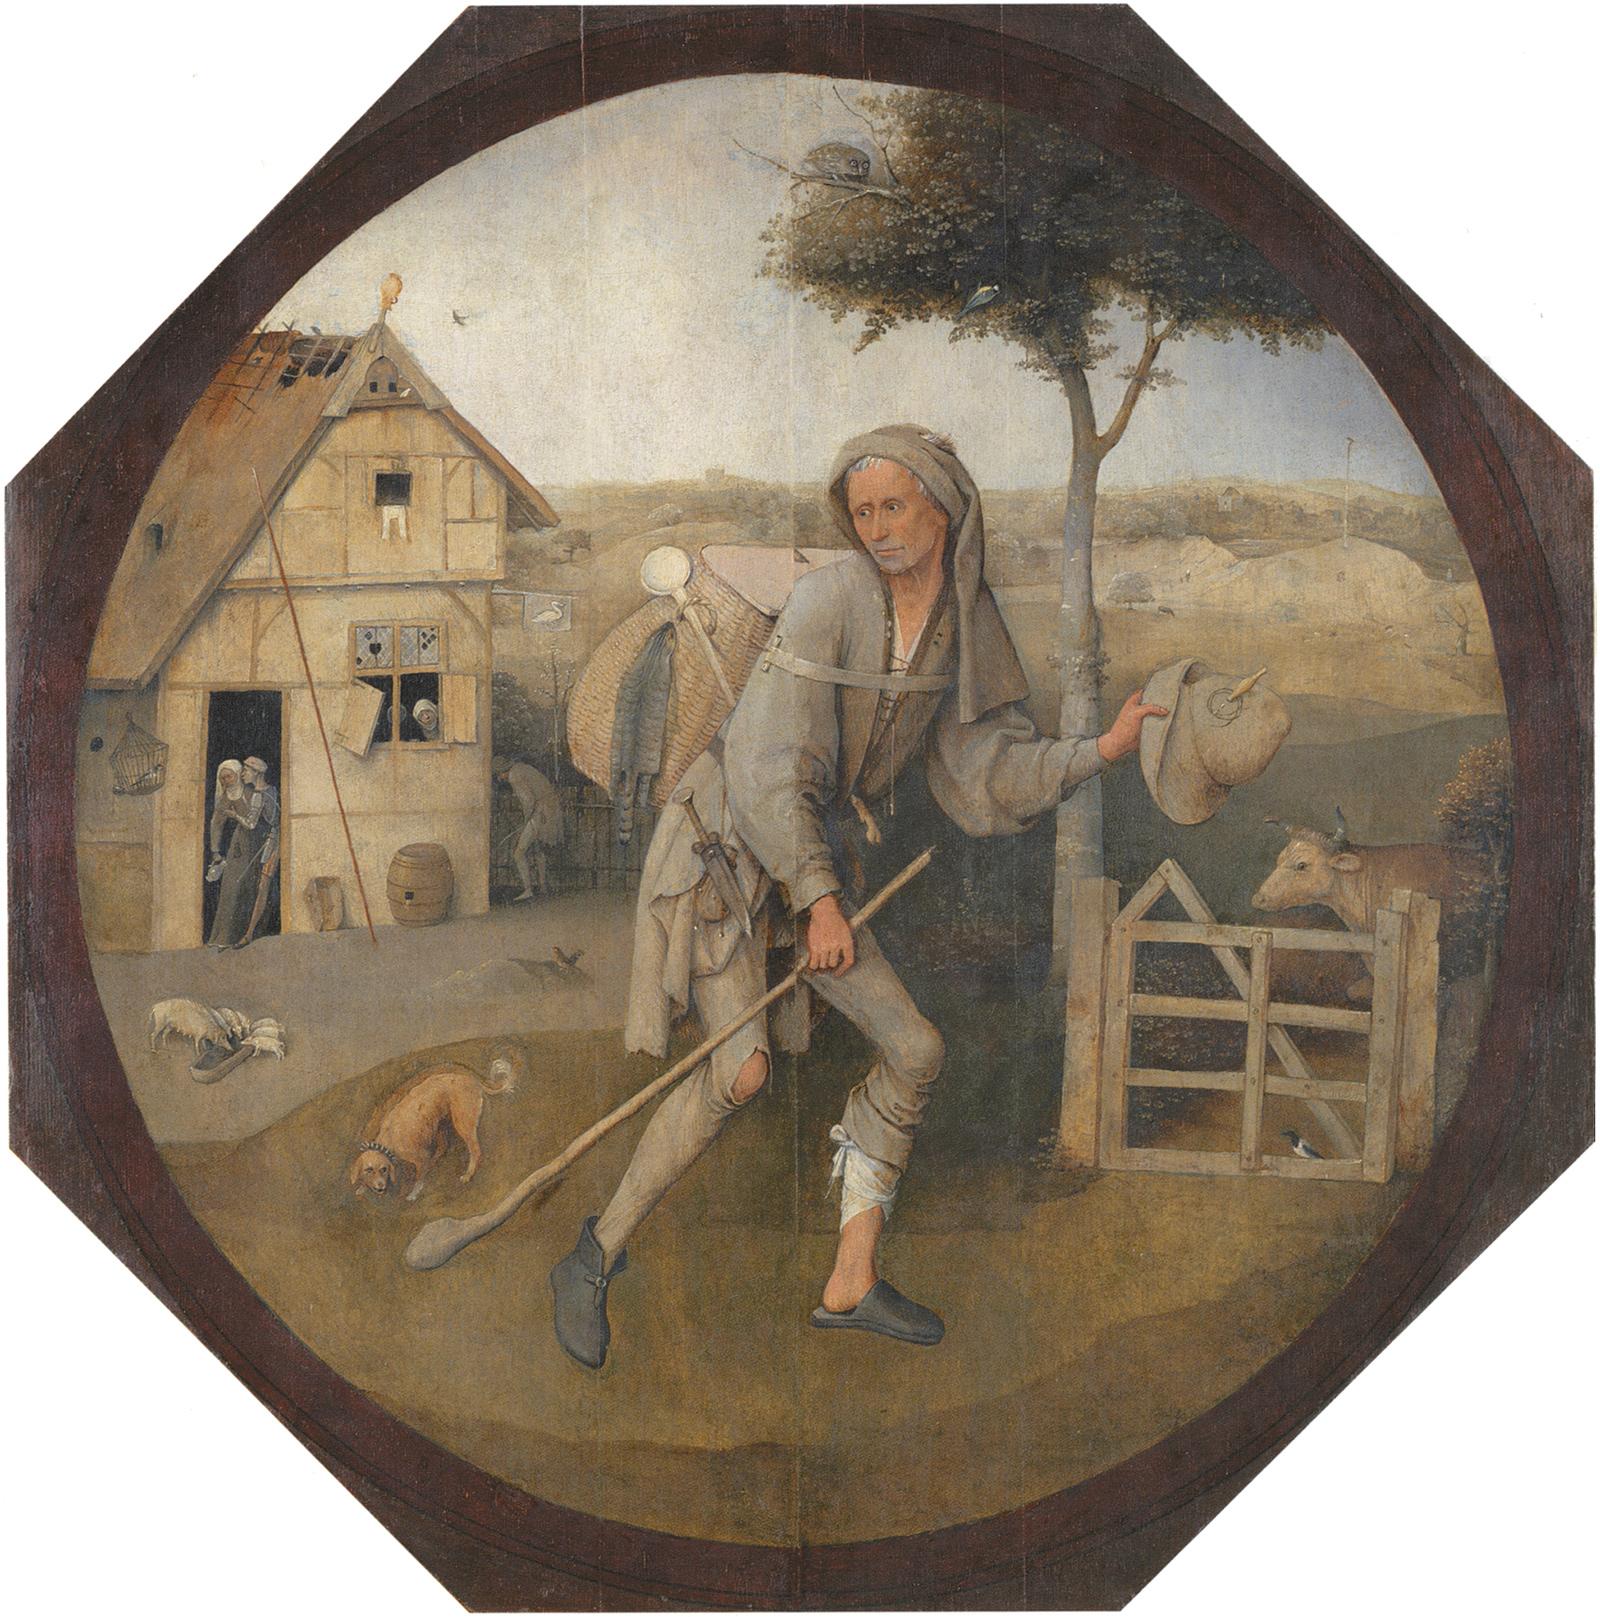 Hieronymus Bosch: The Wayfarer, circa 1500–1510